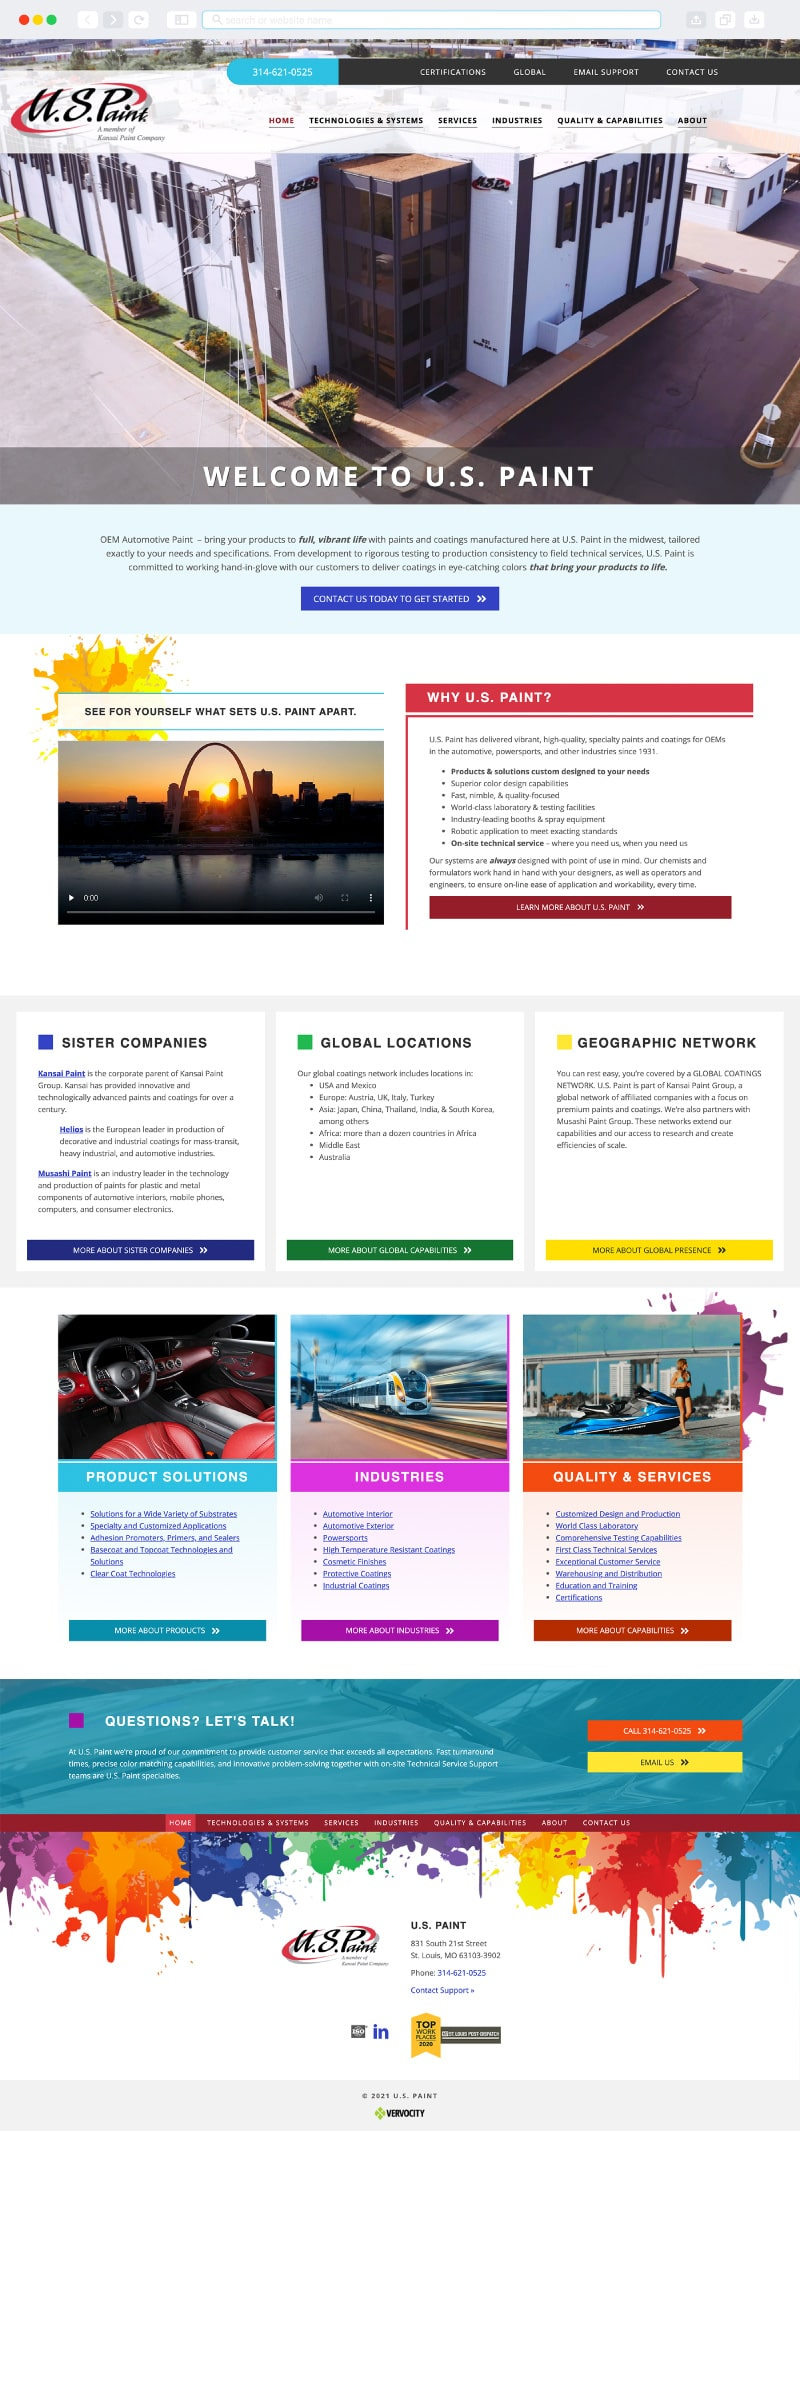 U.S. Paint Homepage